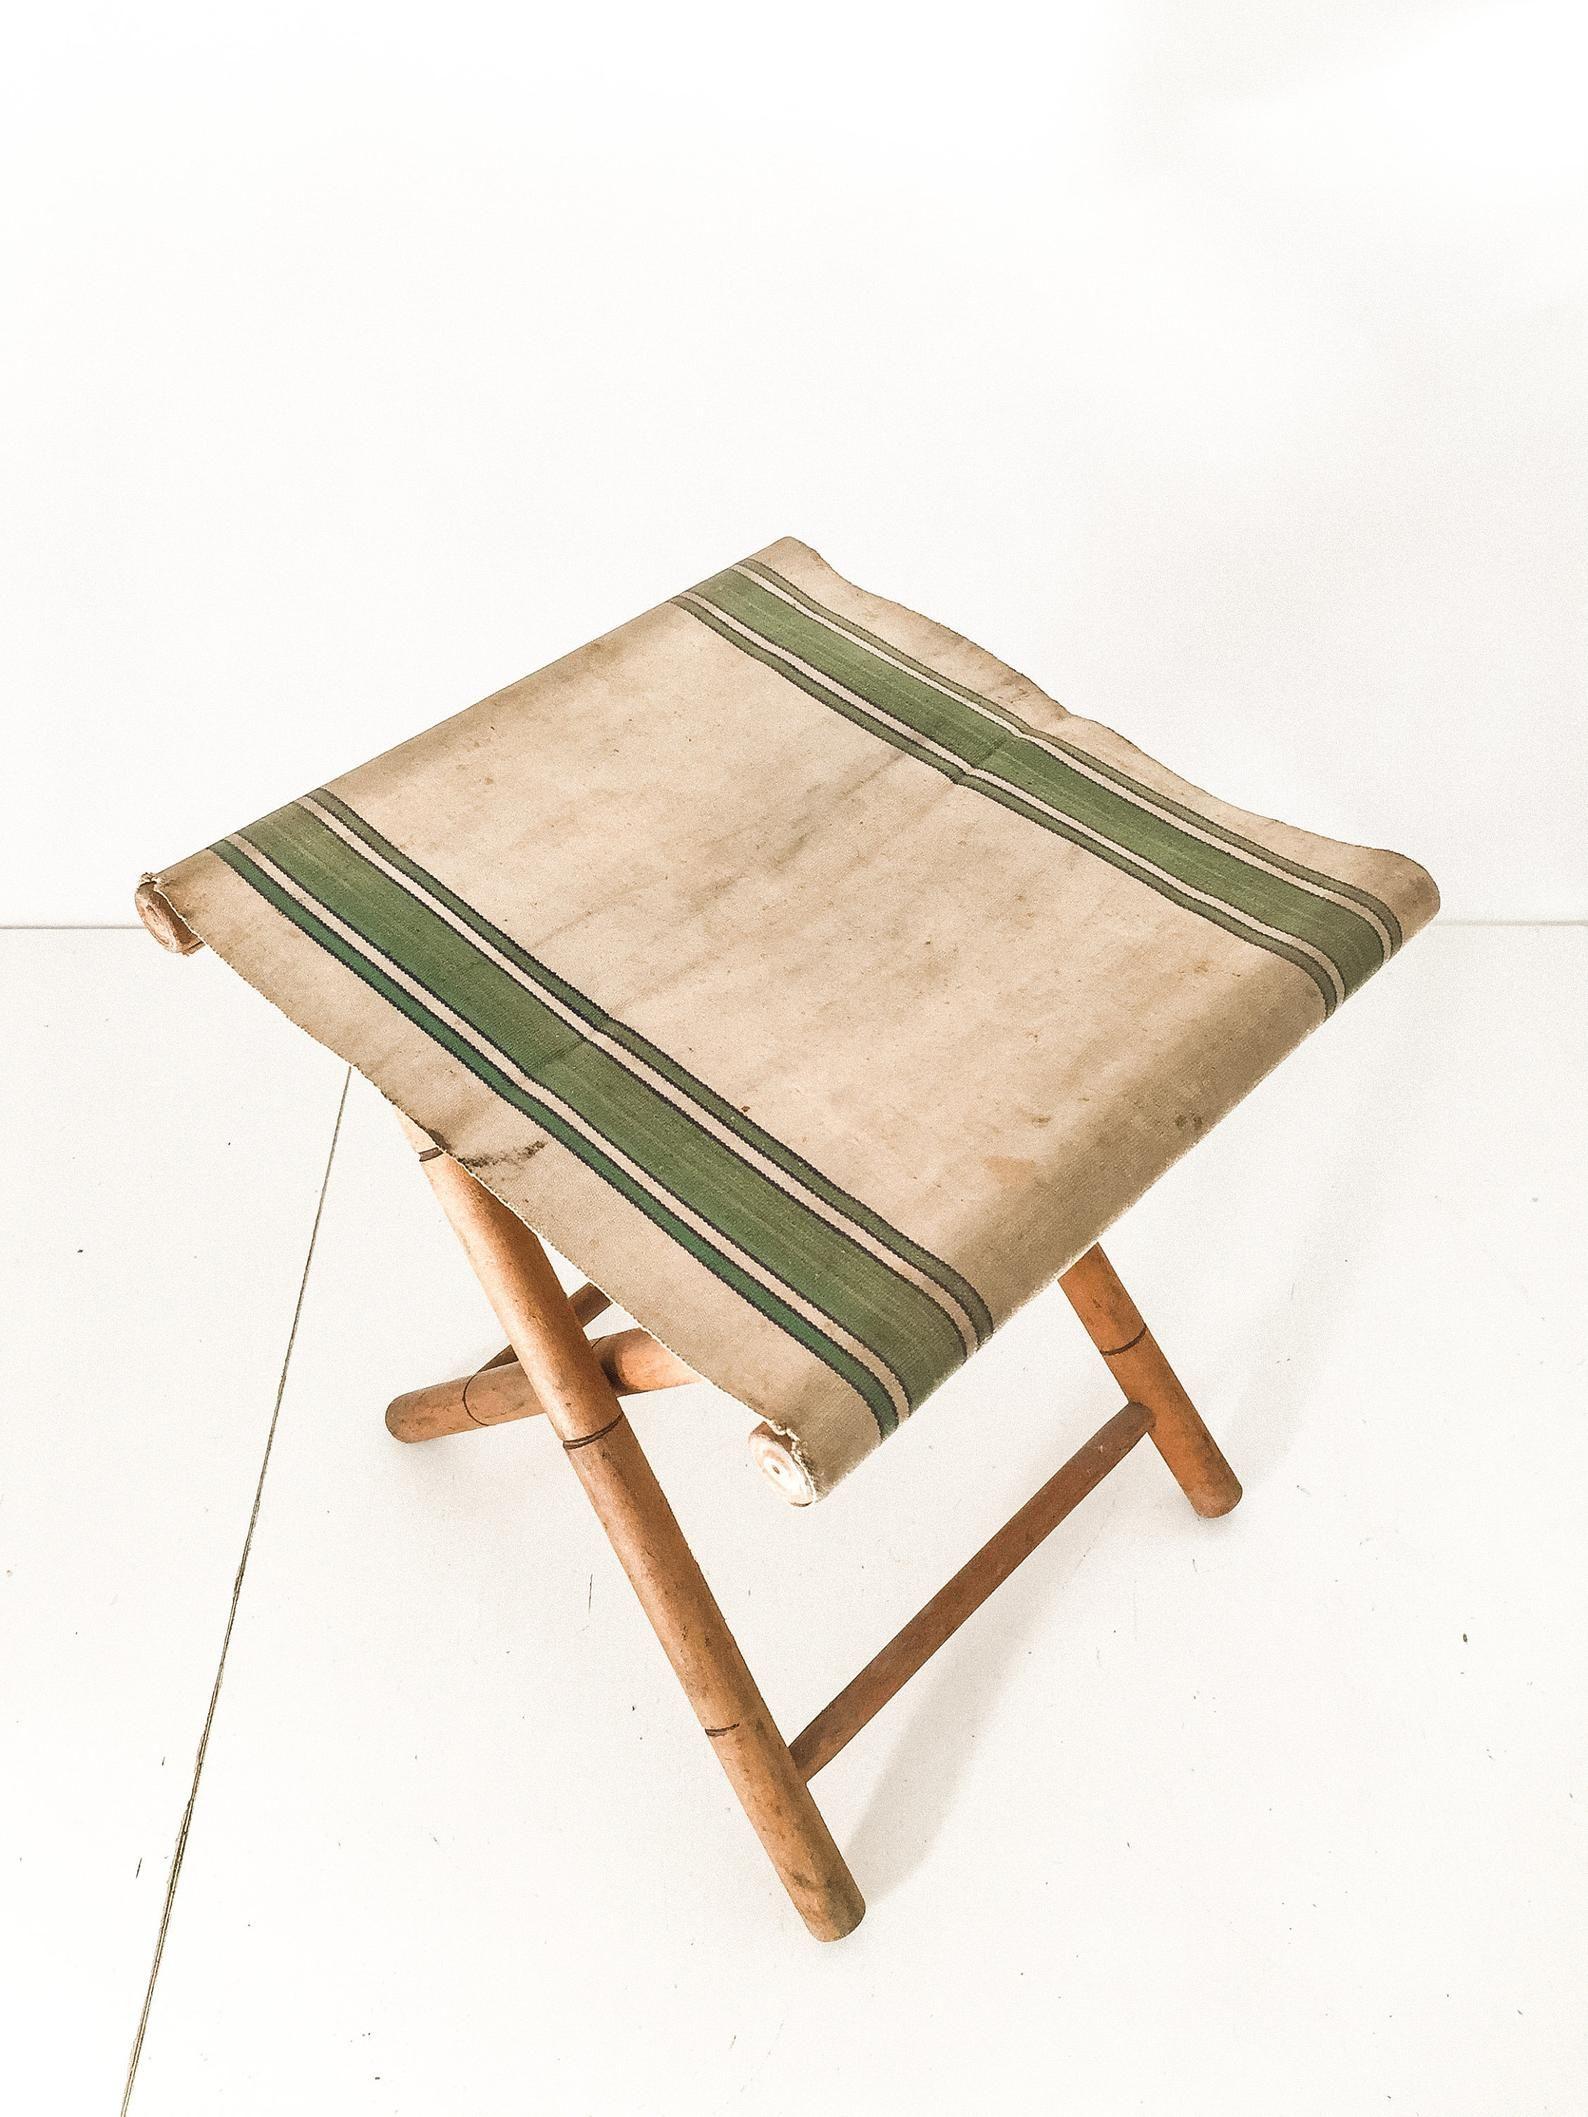 Astonishing Vintage Striped Folding Stool French Wood Canvas Folding Camellatalisay Diy Chair Ideas Camellatalisaycom